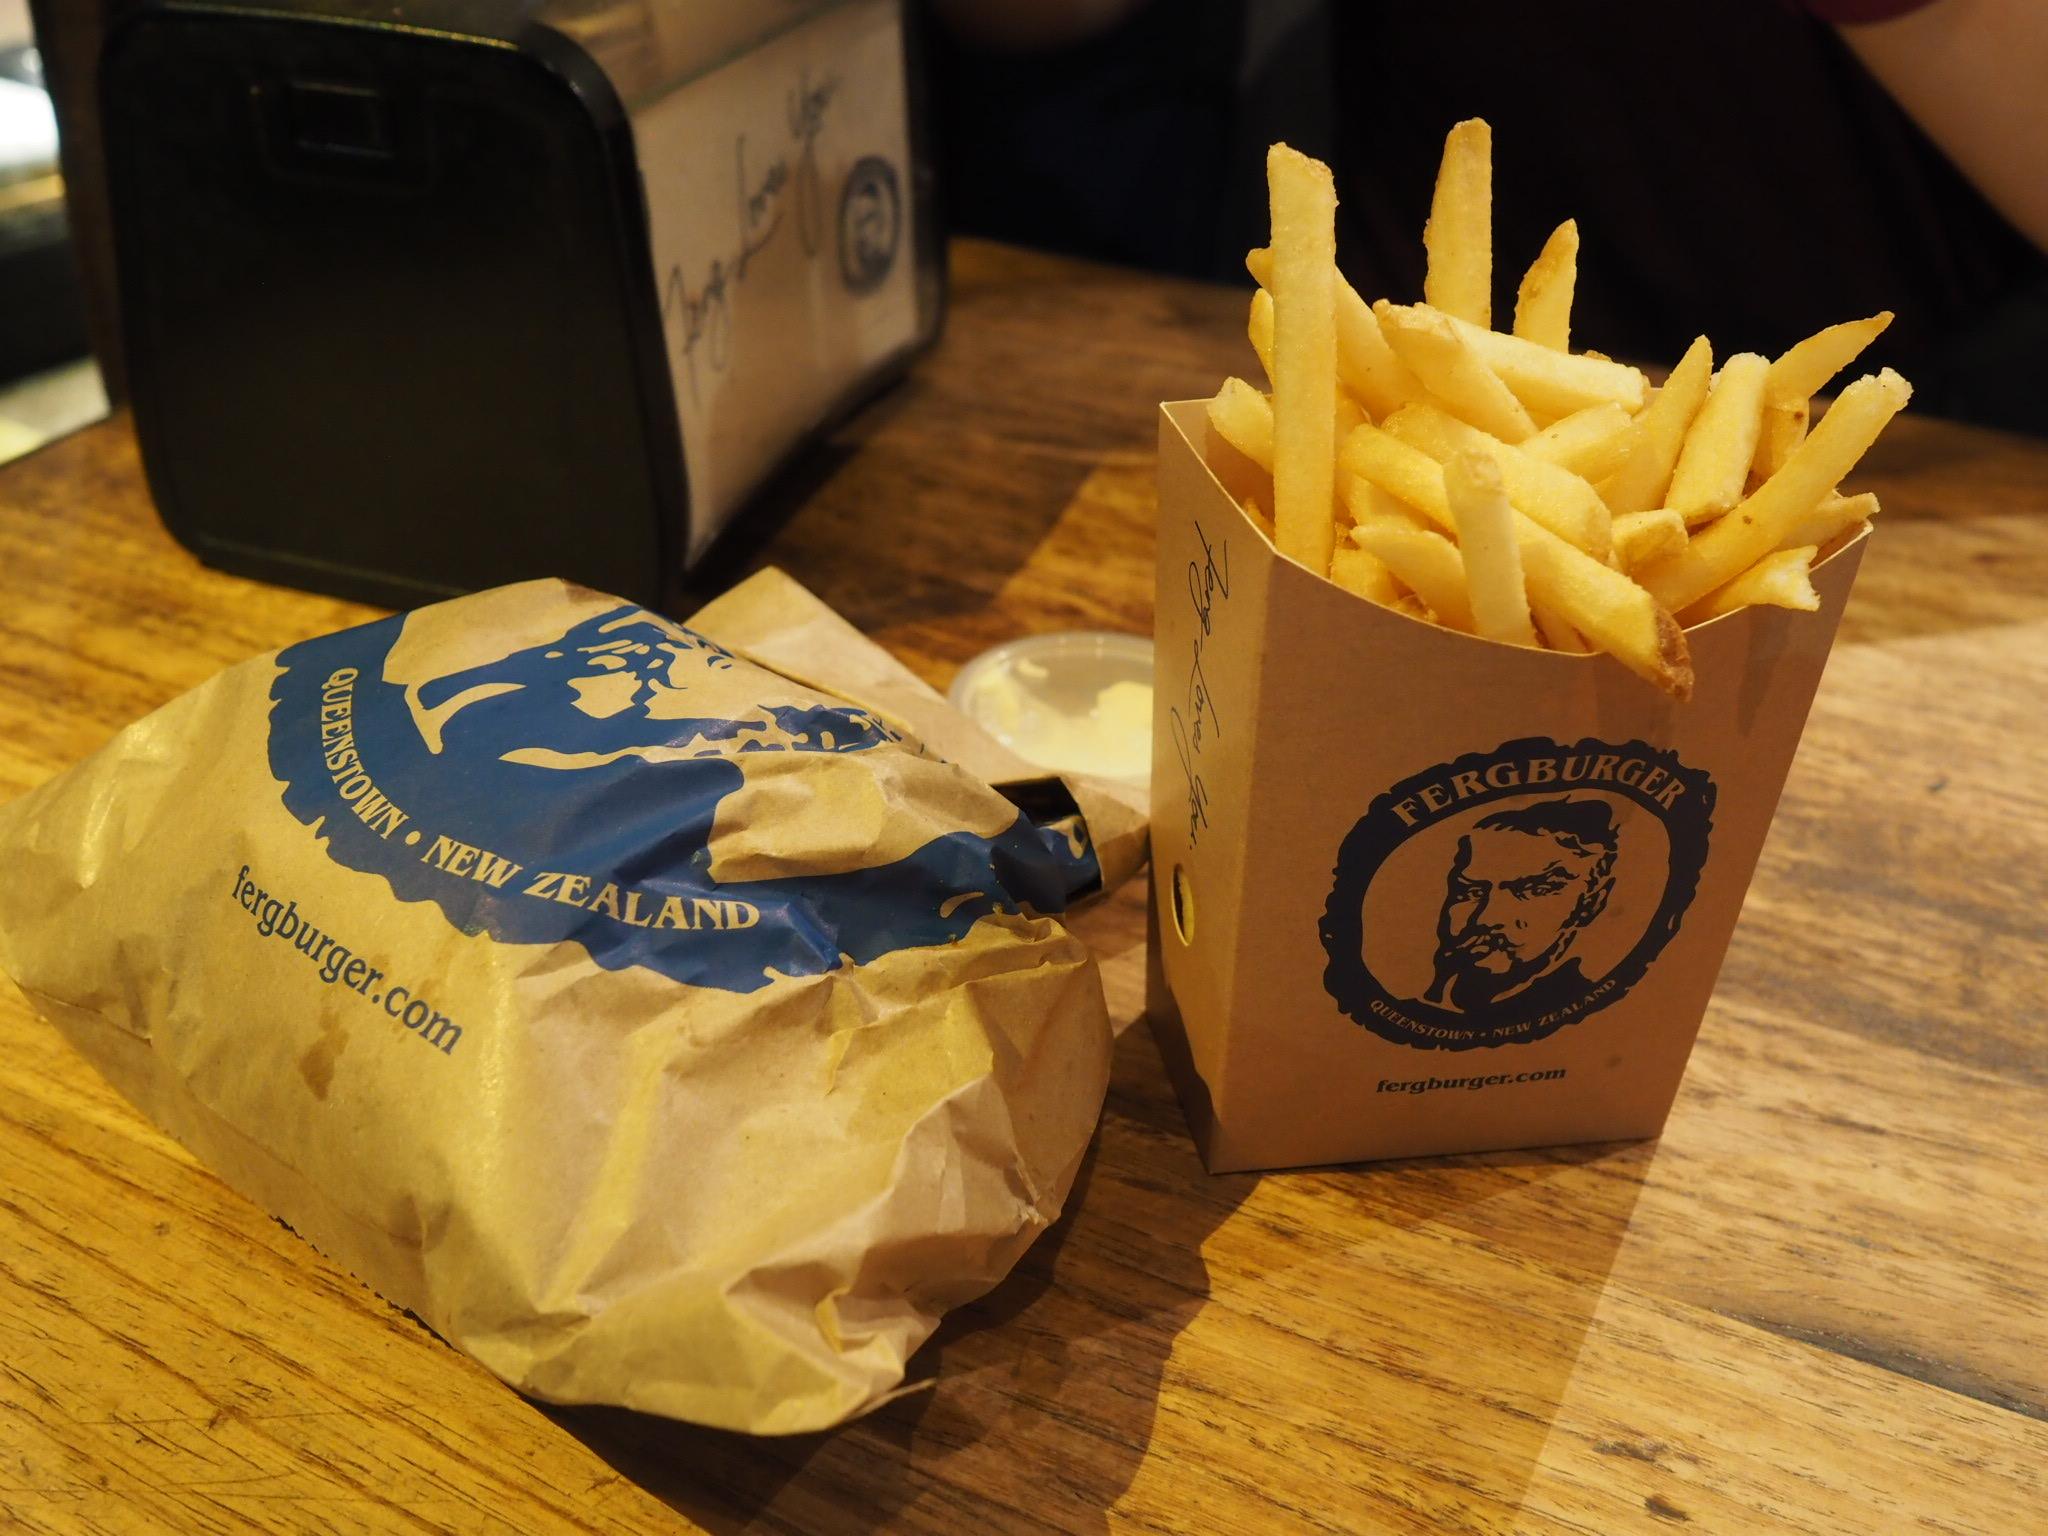 Fergburger fries